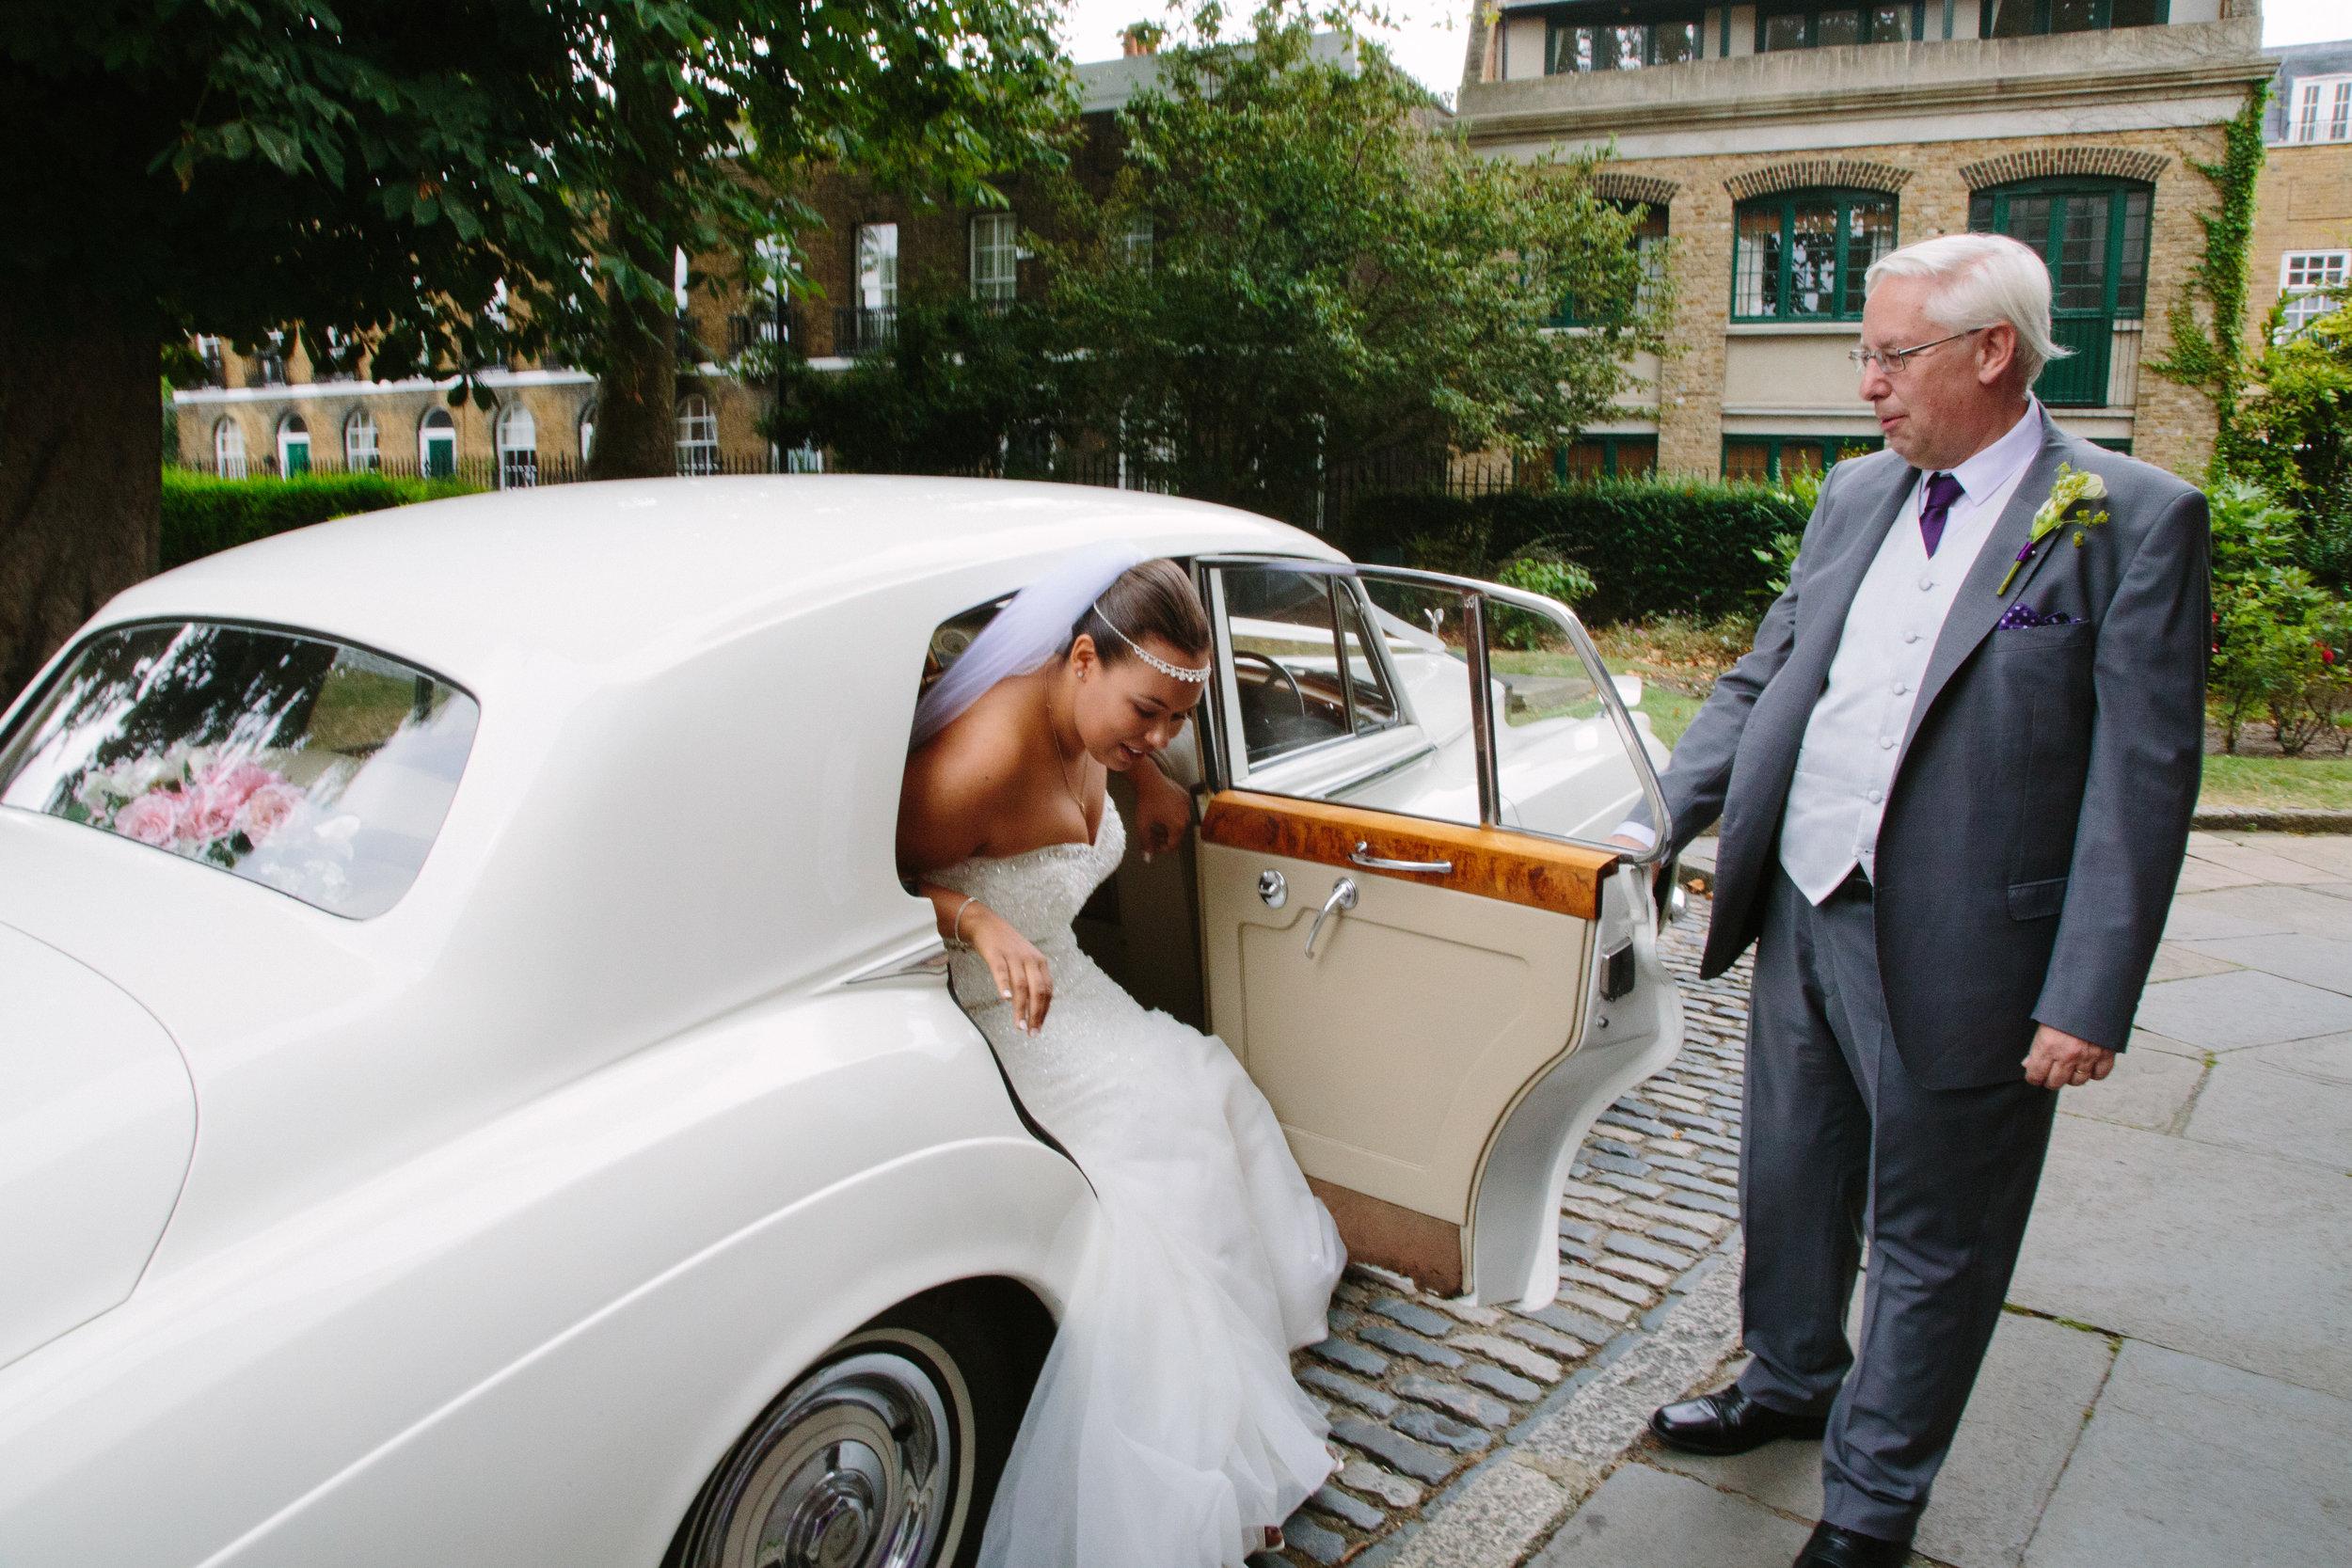 greenwich-charlton-london-wedding-saint-alphege-church-arrival-52